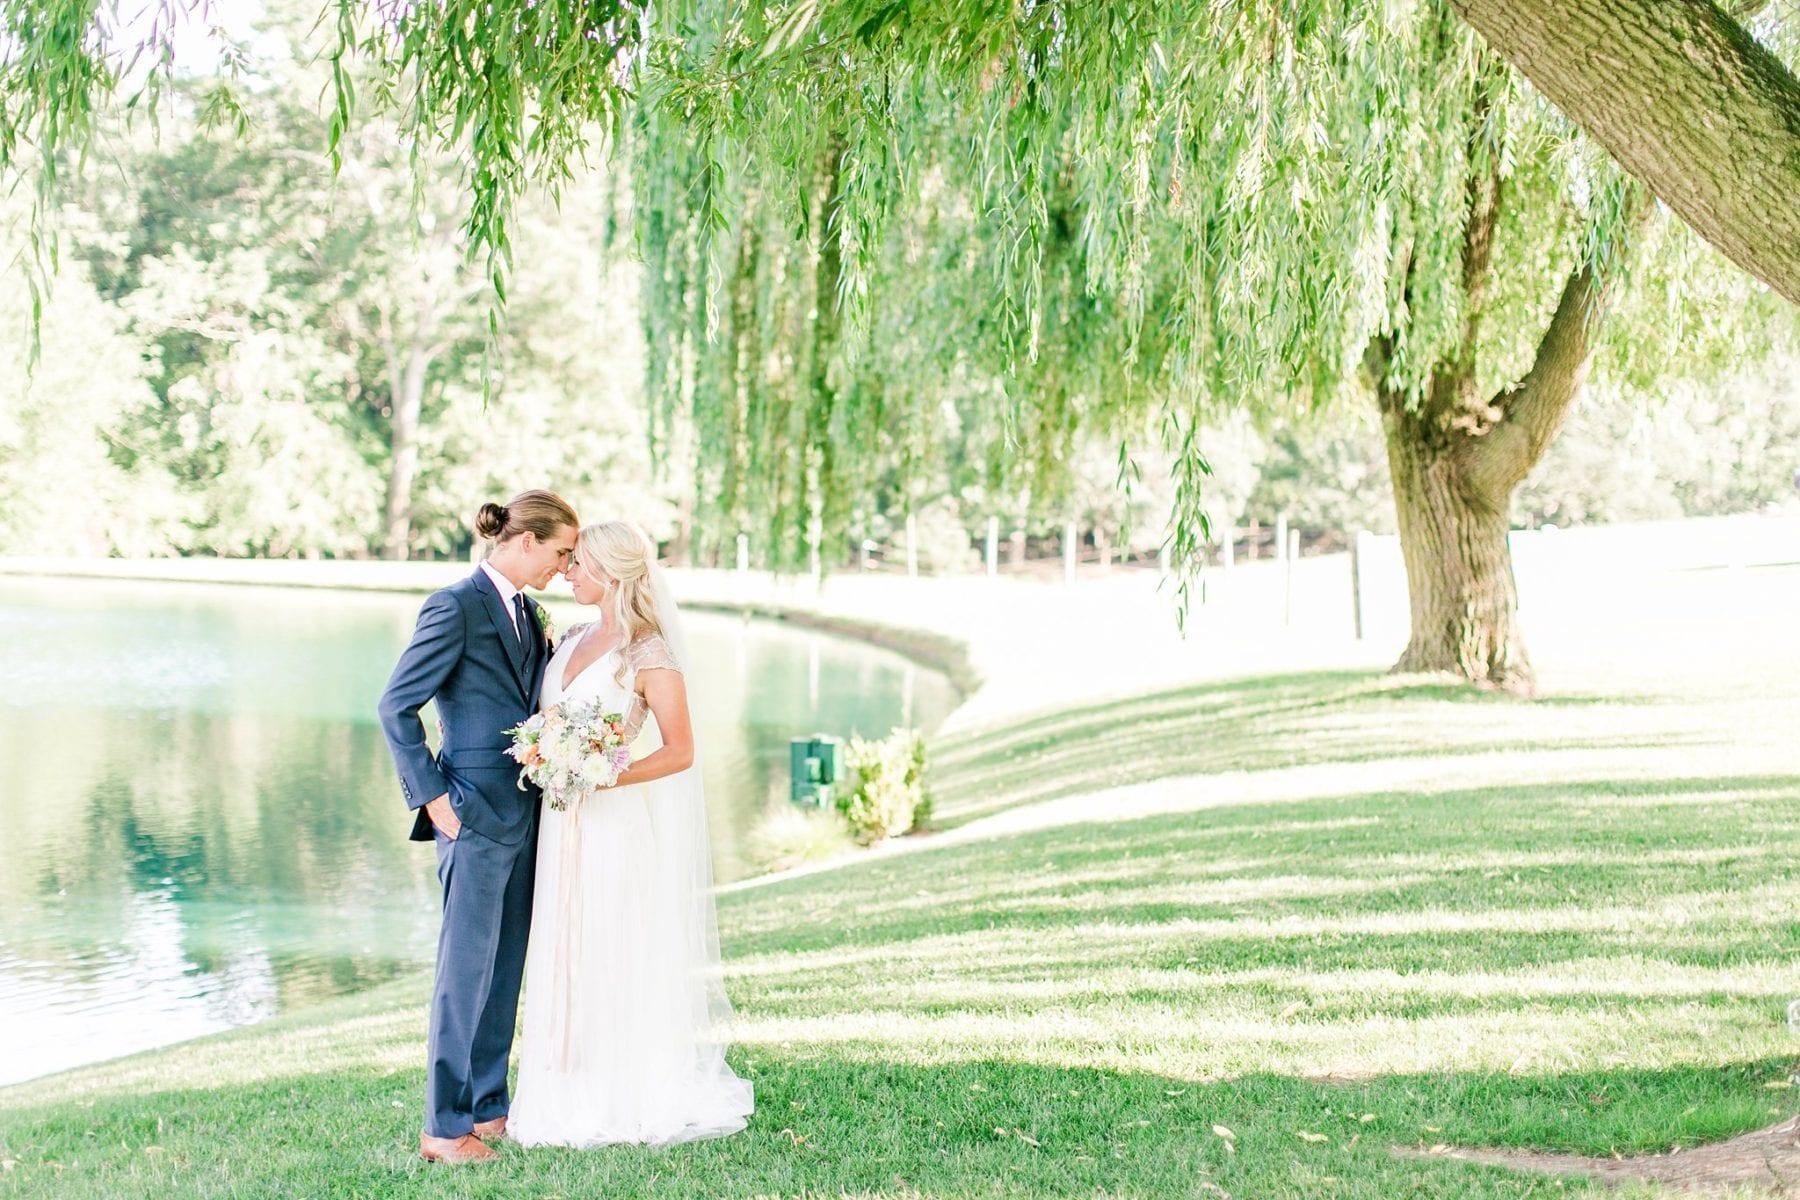 Pond View Farm Wedding Photos Maryland Wedding Photographer Kristen & Ryan Megan Kelsey Photography Blog-173.jpg